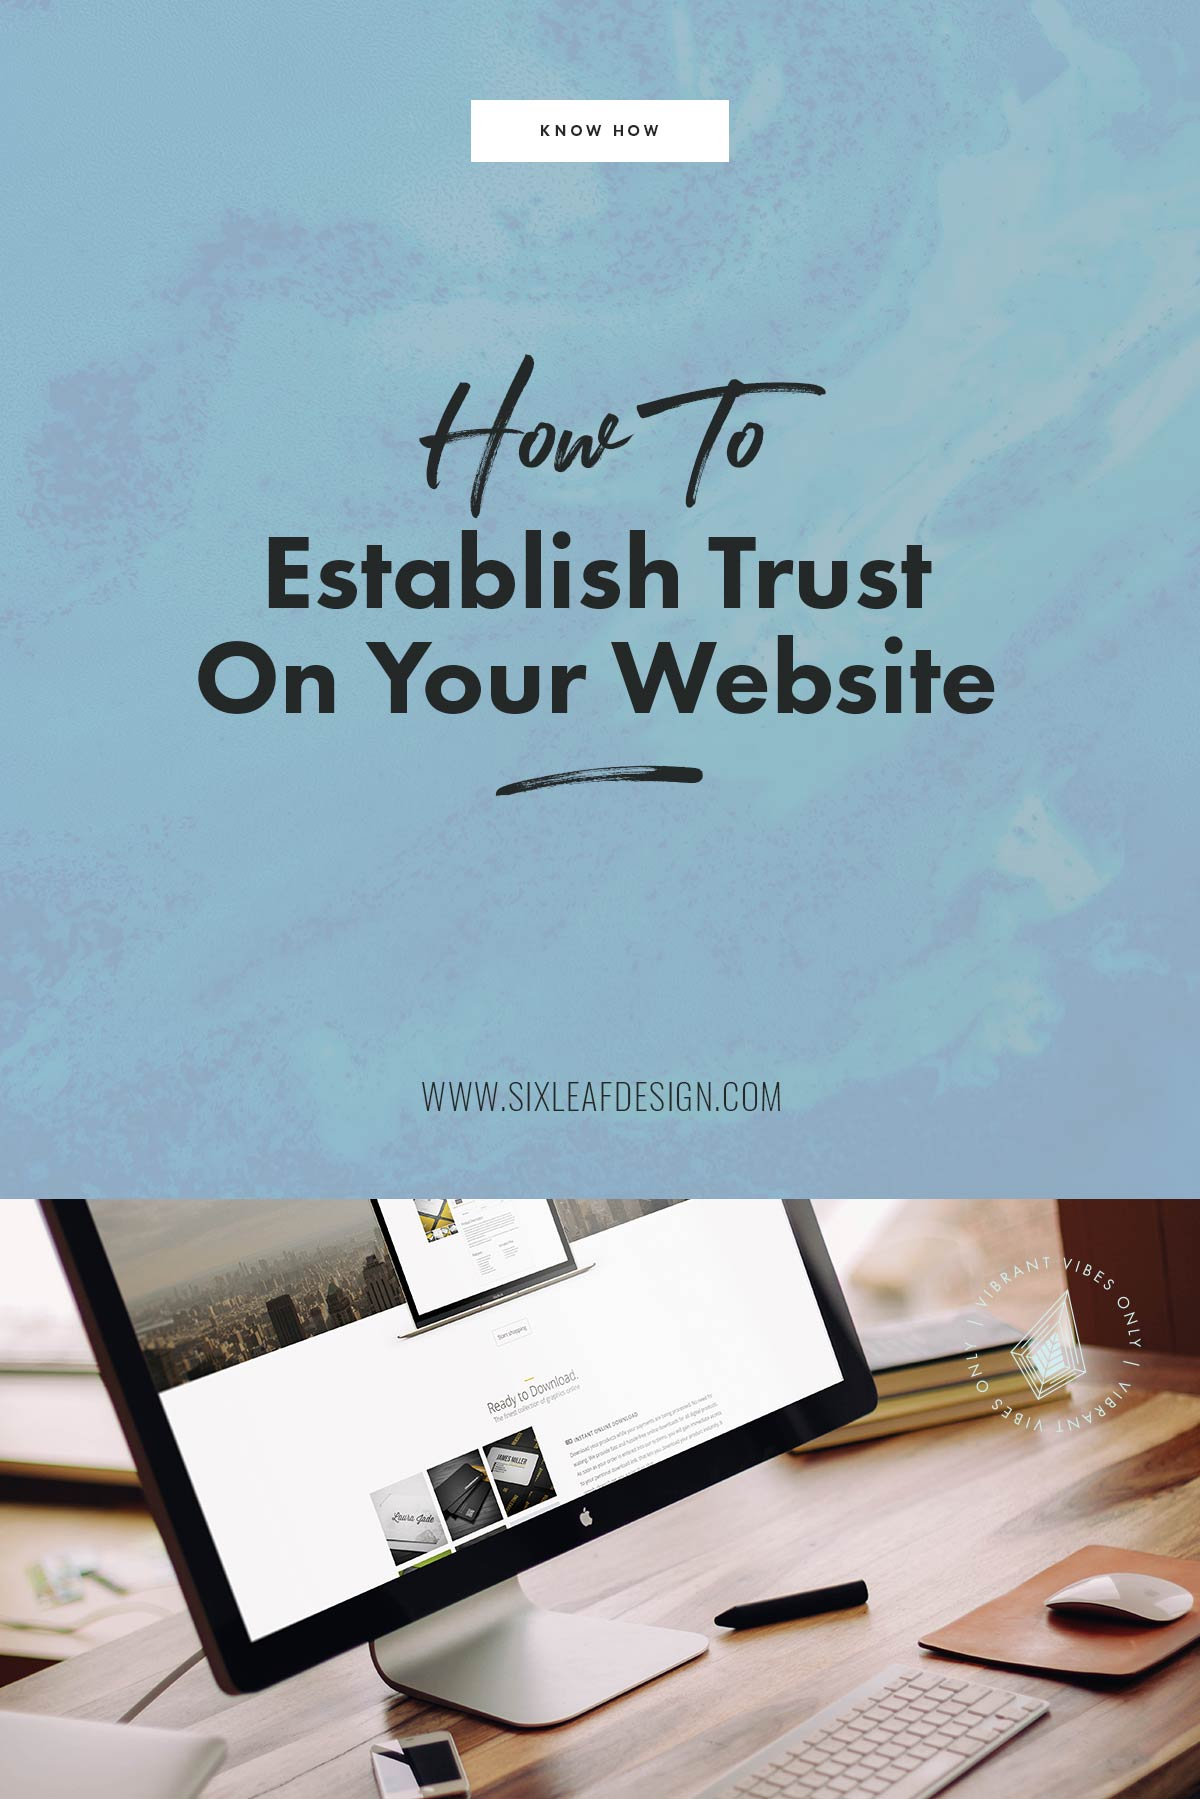 How to Establish Trust on Your Website